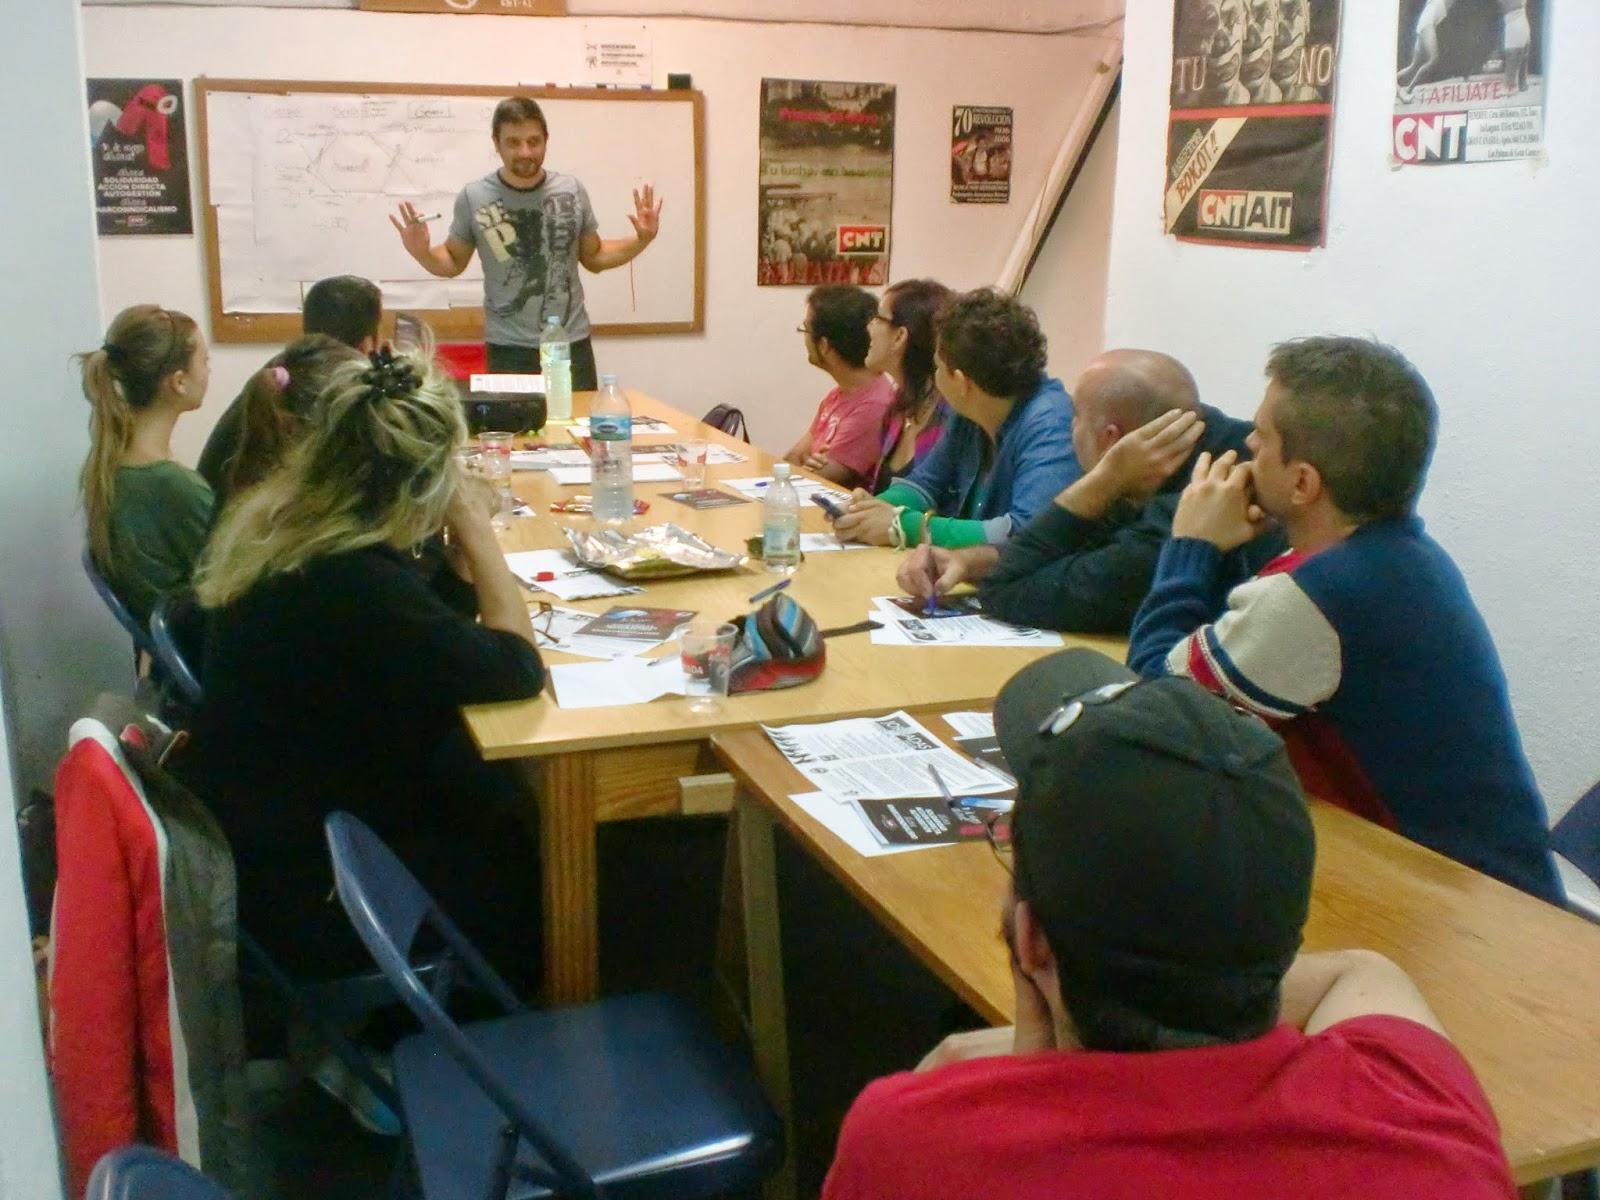 Crónica de las jornadas por la Diversidad Sexual,CNT Canarias,CNT AIT Canarias, Canarias,CNT AIT,los anarquistas,frases anarquistas,los anarquistas,anarquista,anarquismo, frases de anarquistas,anarquia,la anarquista,el anarquista,a anarquista,anarquismo, anarquista que es,anarquistas,el anarquismo,socialismo,el anarquismo,o anarquismo,greek anarchists,anarchist, anarchists cookbook,cookbook, the anarchists,anarchist,the anarchists,sons anarchy,sons of anarchy, sons,anarchy online,son of anarchy,sailing,sailing anarchy,anarchy in uk,   anarchy uk,anarchy song,anarchy reigns,anarchist,anarchism definition,what is anarchism, goldman anarchism,cookbook,anarchists cook book, anarchism,the anarchist cookbook,anarchist a,definition anarchist, teenage anarchist,against me anarchist,baby anarchist,im anarchist, baby im anarchist, die anarchisten,frau des anarchisten,kochbuch anarchisten, les anarchistes,leo ferre,anarchiste,les anarchistes ferre,les anarchistes ferre, paroles les anarchistes,léo ferré,ferré anarchistes,ferré les anarchistes,léo ferré,  anarchia,anarchici italiani,gli anarchici,canti anarchici,comunisti, comunisti anarchici,anarchici torino,canti anarchici,gli anarchici,communism socialism,communism,definition socialism, what is socialism,socialist,socialism and communism,CNT, 无政府主义,社会主义社会,社会,中国社会主义,社会主义建设,中国特色,社会主义经济,社会主义理论,社会主义好,CNT, 共产,中国共产主义,青年团,共产主义社会,社会主义,共产主义理想,共产主义者,共産主義社会,共産主義,資本主義社会,社会資本主義,資本主義,資本社会,民主主義社会,CNT,共産,共産主義社会,社会主義,共産社会主義,共産主義者,共産党,資本主義, 공산주의,사회주의공산주의,공산주의사회주의,사회주의국가,국가사회주의,사회주의반대,CNT, 공산주의반대,공산주의반대말,공산주의의반대,사회주의공산주의,공산주의사회주의,사회주의, кто такие анархисты,анархия,национал социализм,коммунизм социализм,коммунизм,социализм капитализм,капитализм,социализм это,утопический социализм,либерализм,консерватизм,что такое социализм,CNT,